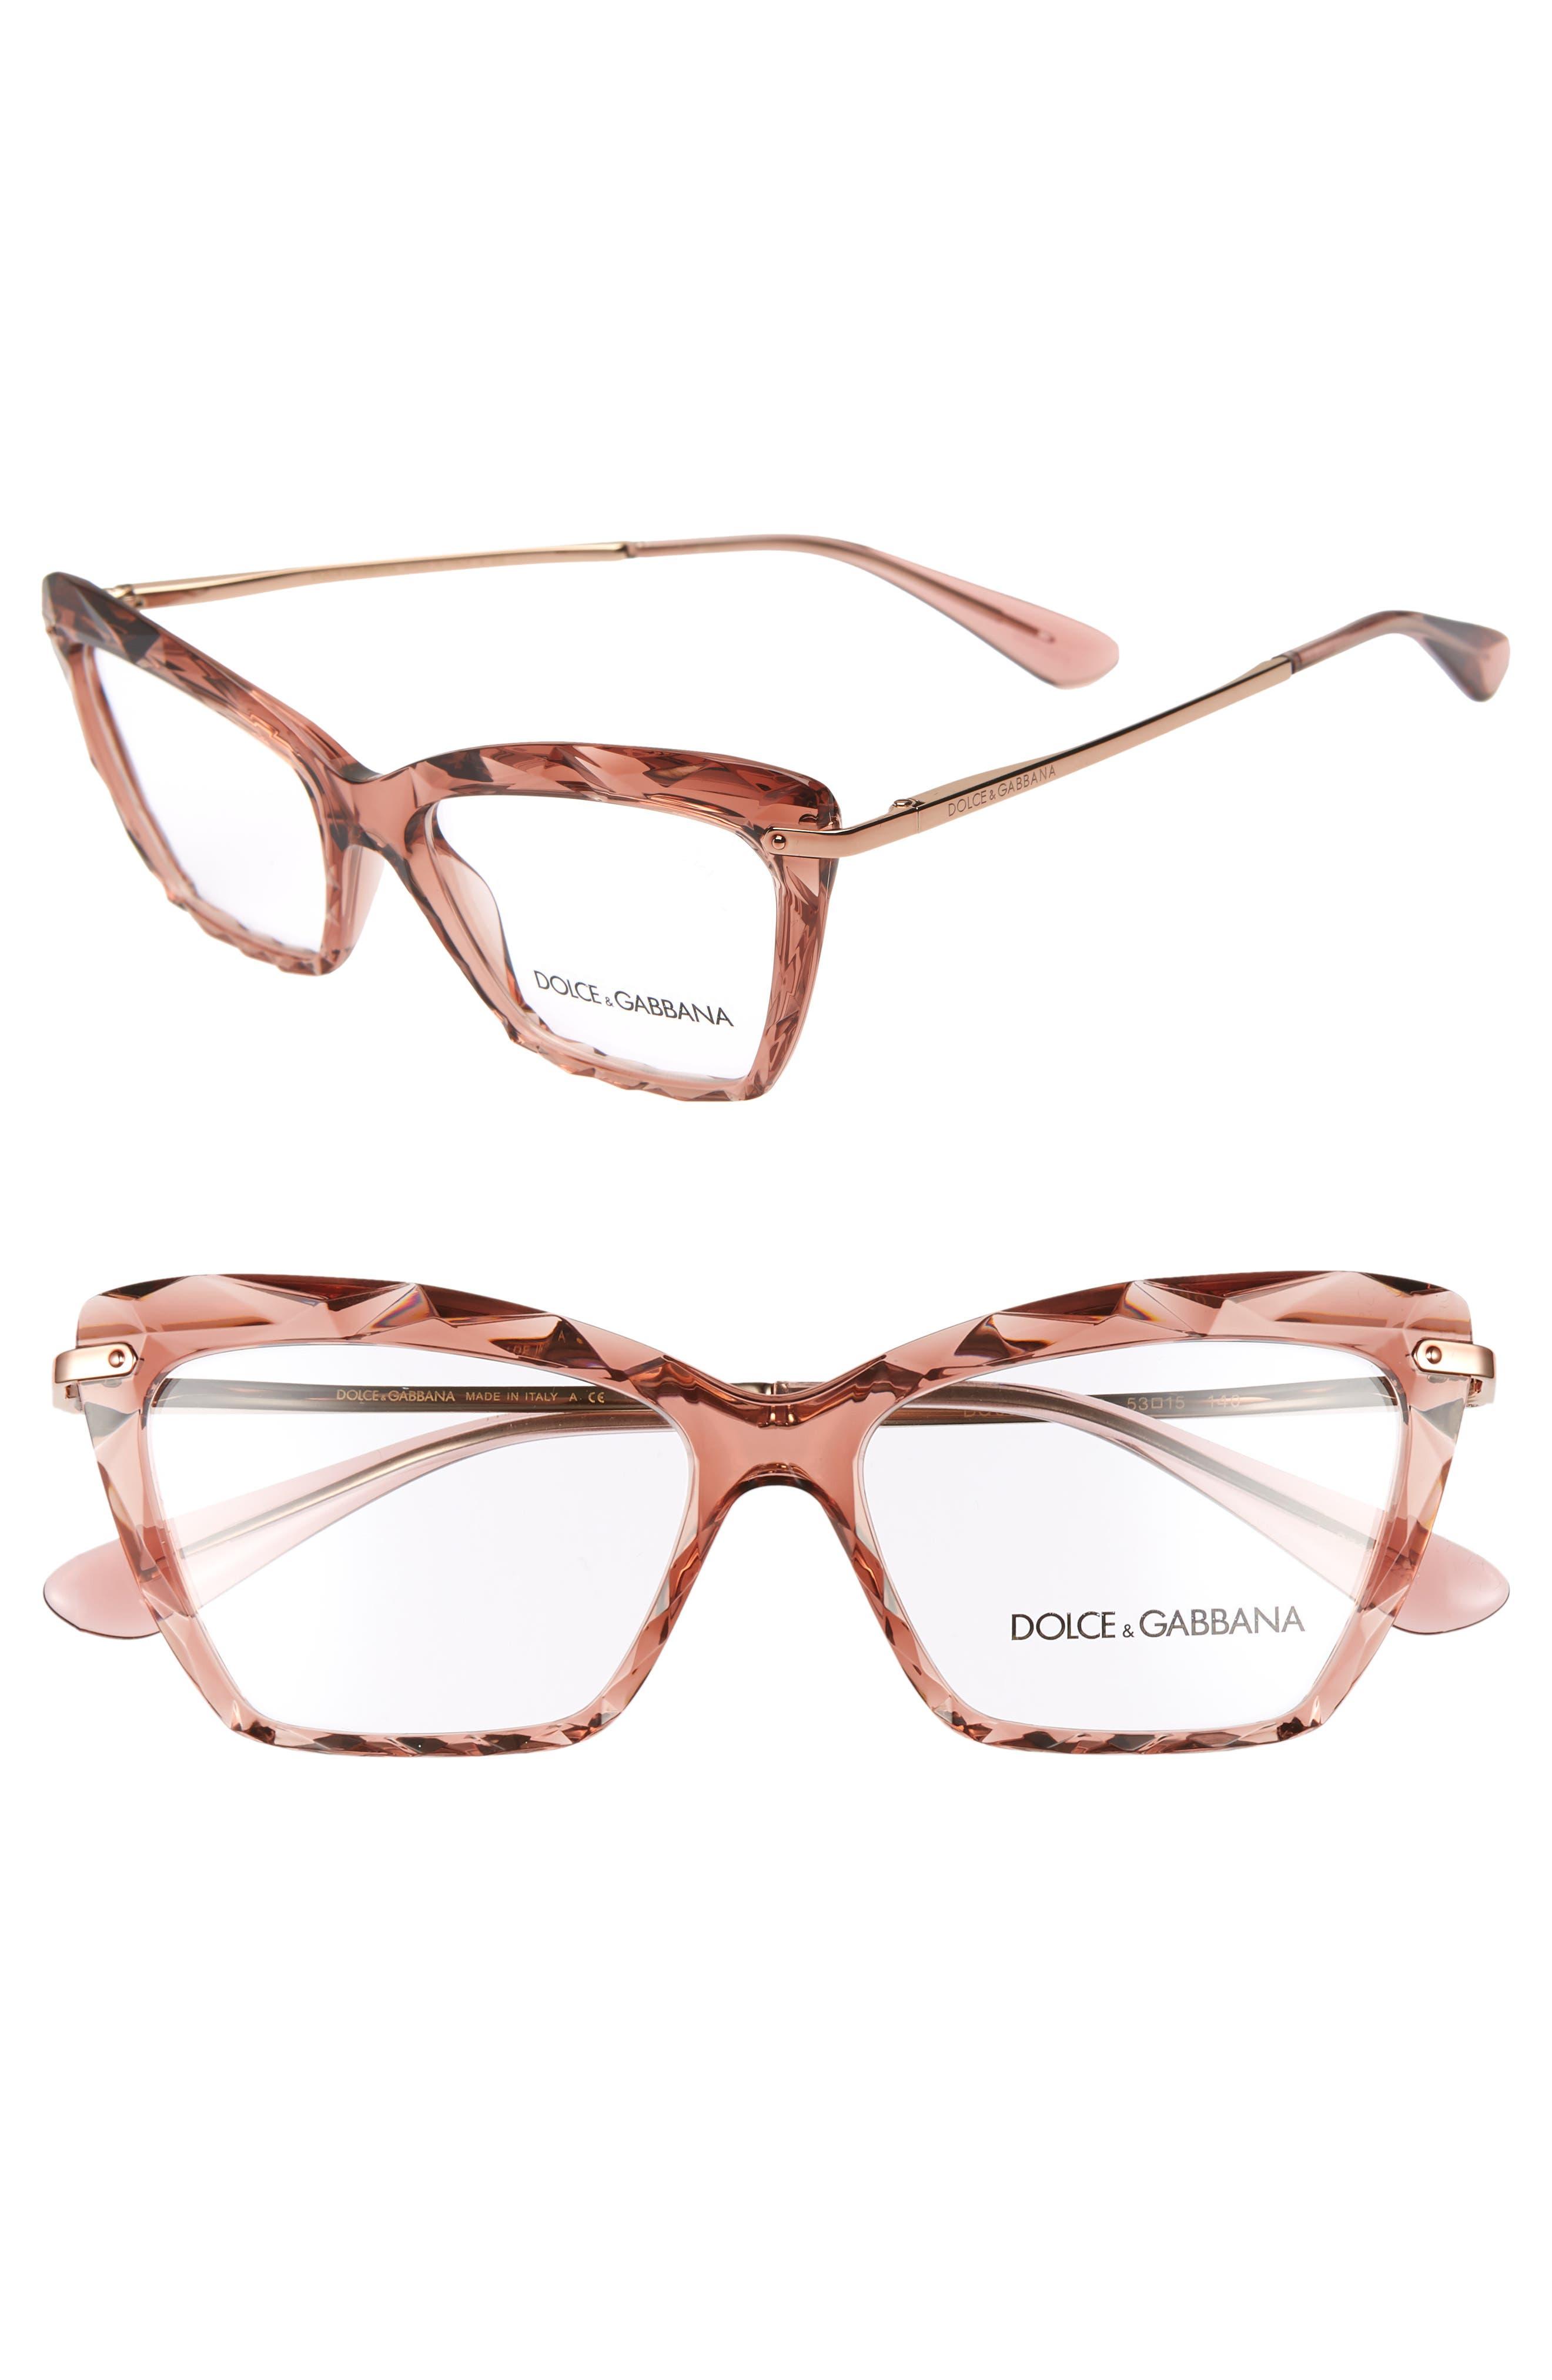 DOLCE&GABBANA 53mm Cat Eye Optical Glasses, Main, color, TRANSPARENT PINK